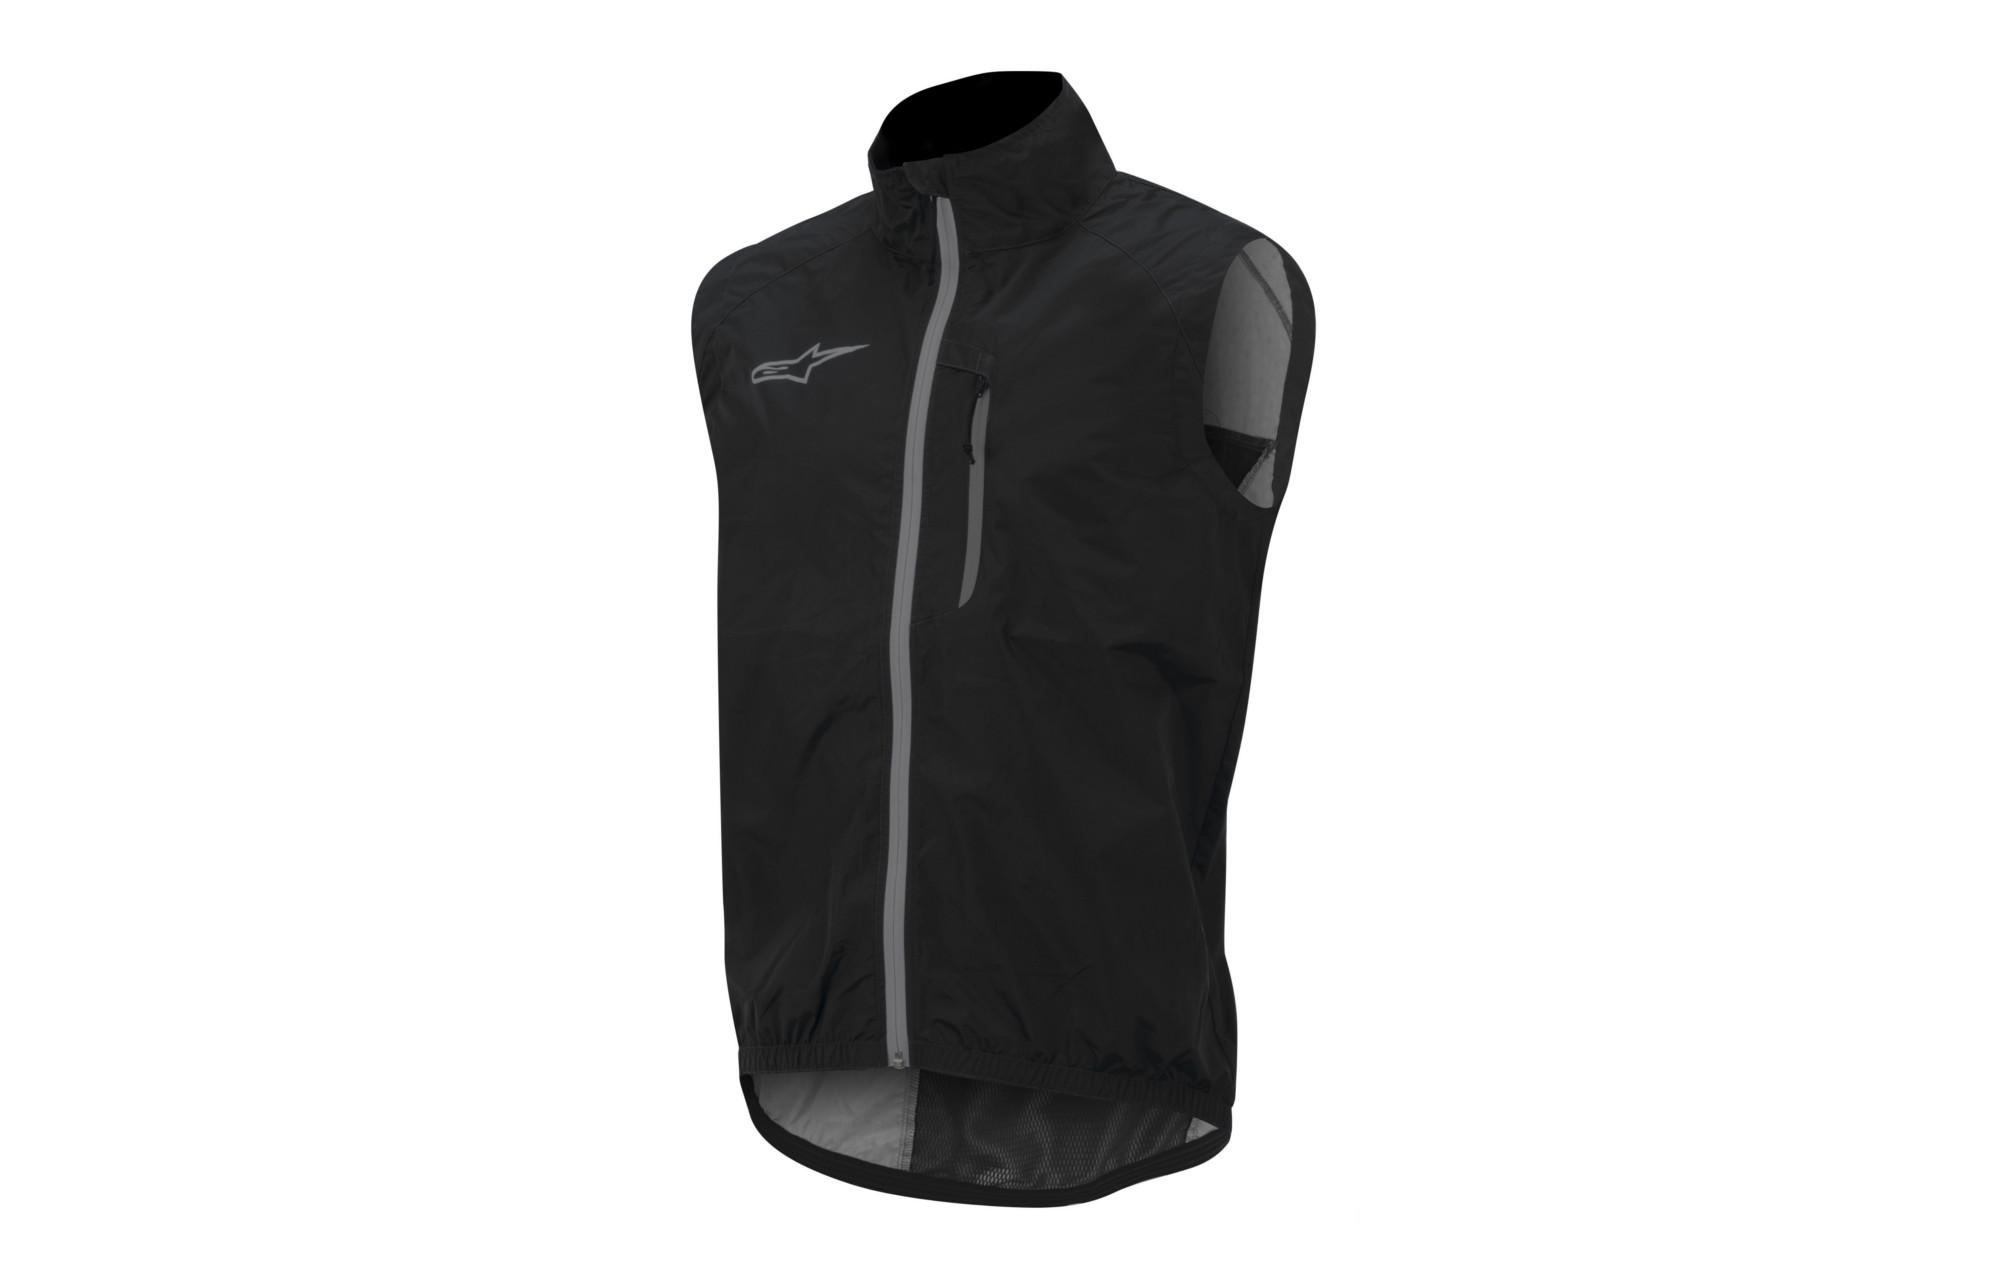 alpinestars veste coupe vent sans manches descender noir. Black Bedroom Furniture Sets. Home Design Ideas